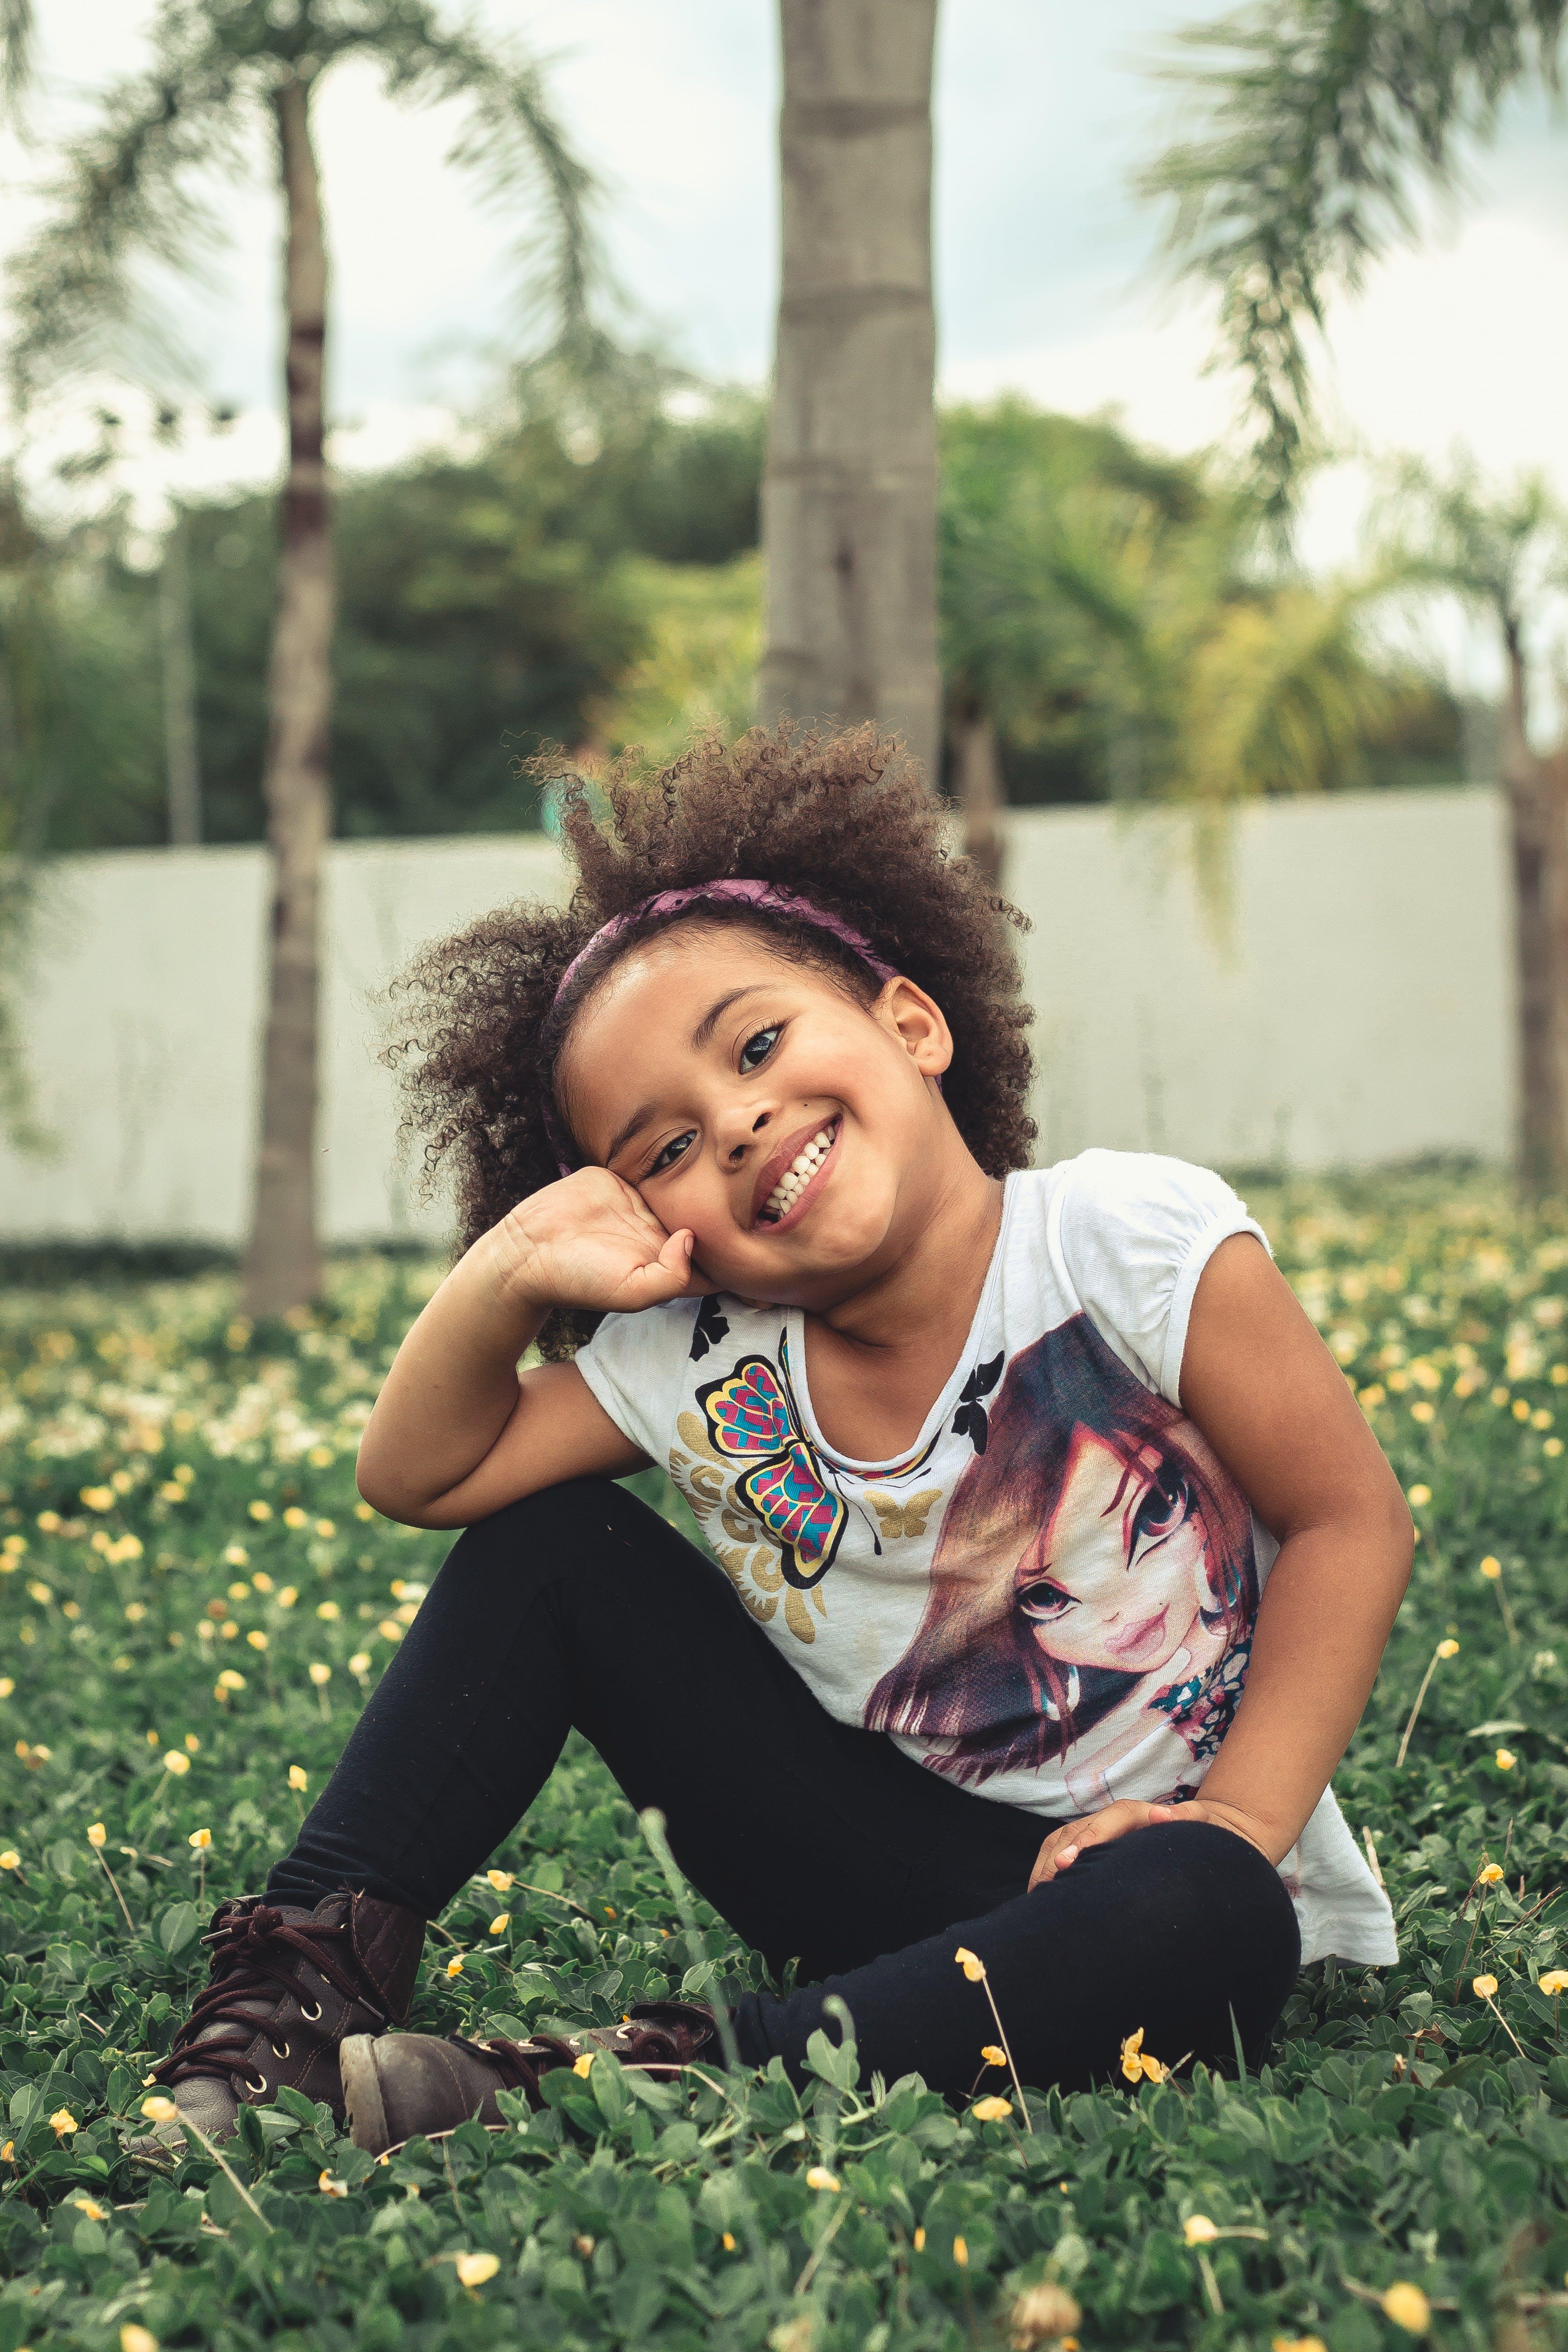 Kostenloses Stock Foto zu afro, bezaubernd, draußen, erholung